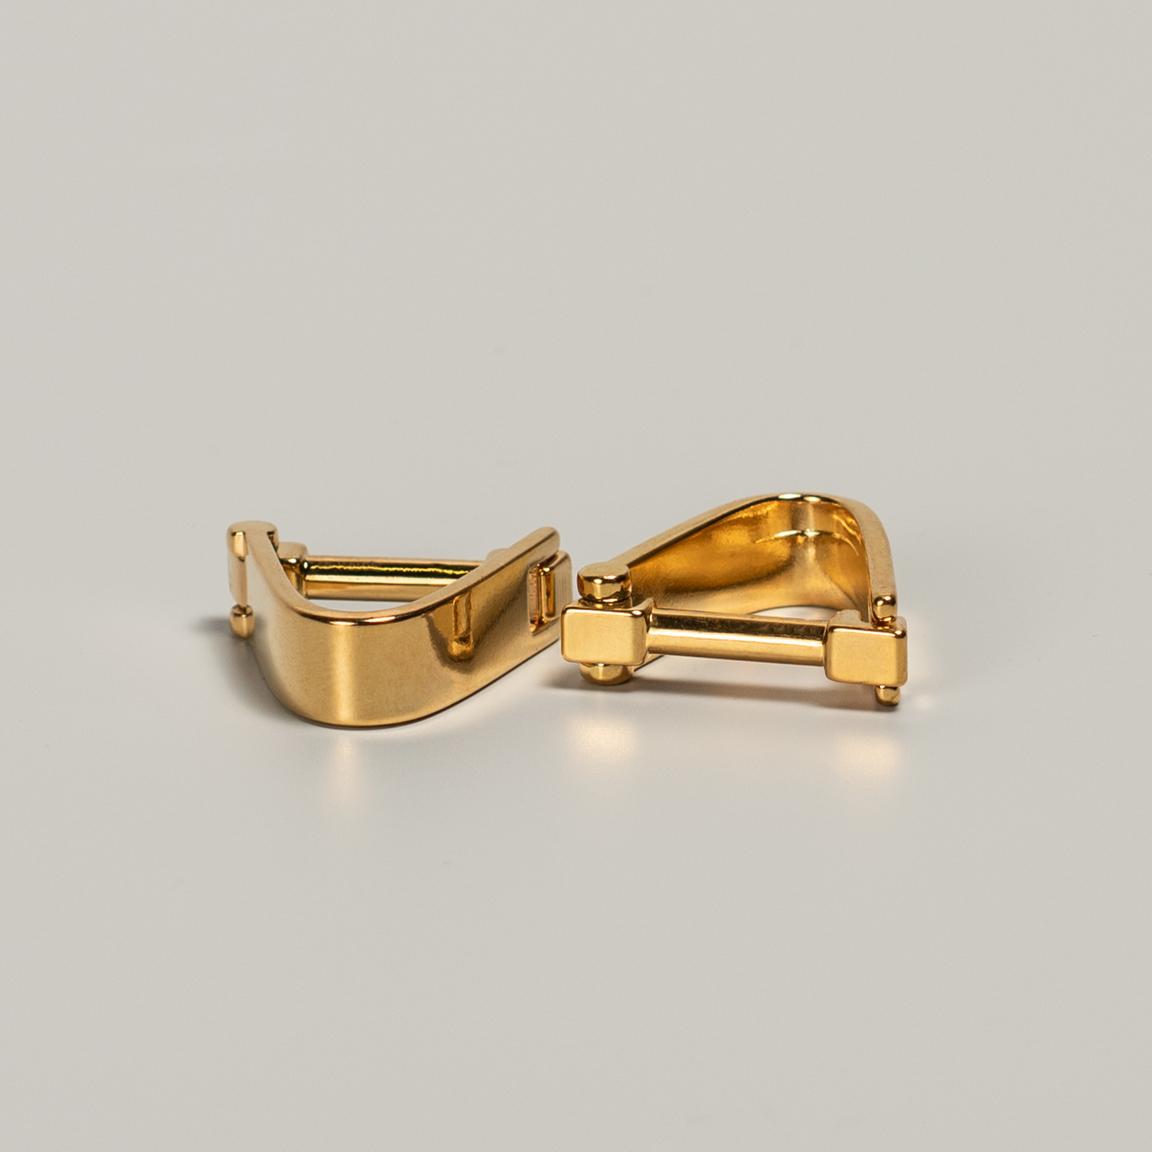 Gold colored cufflinks